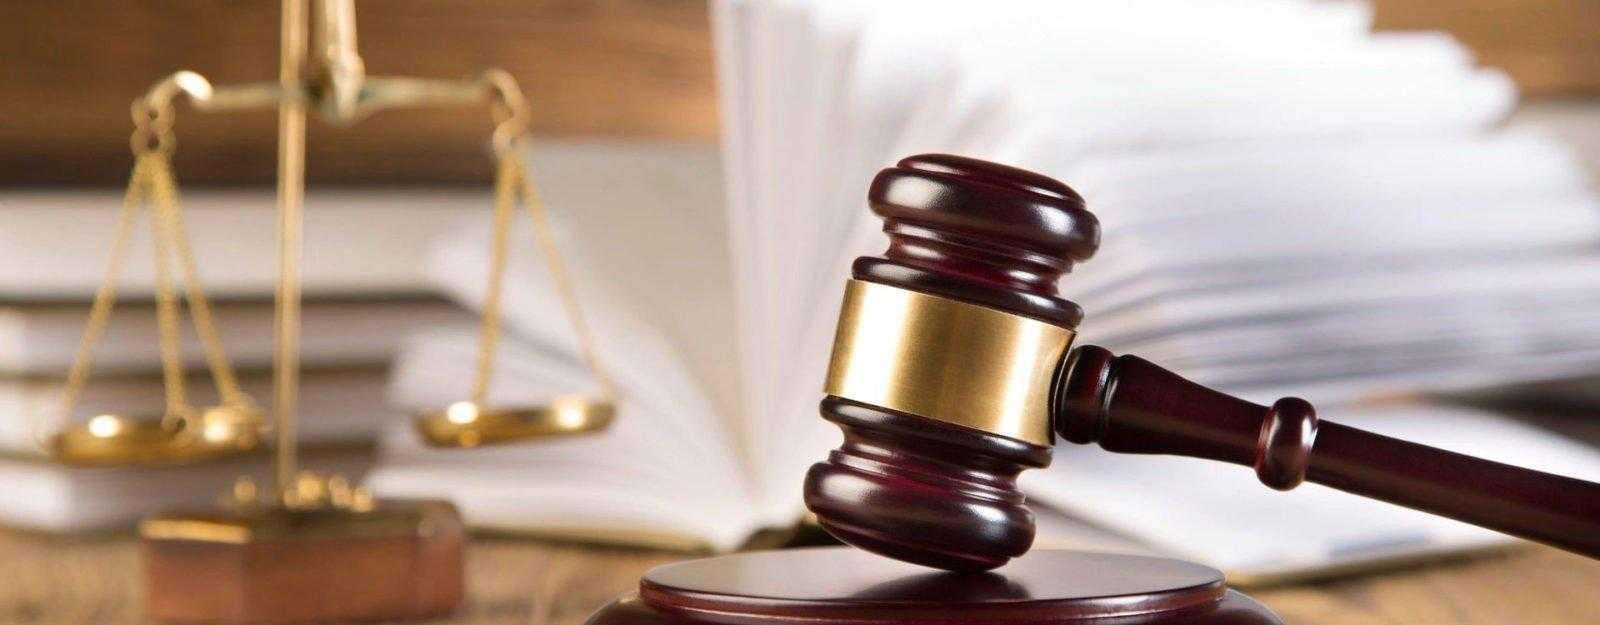 представительство в судах